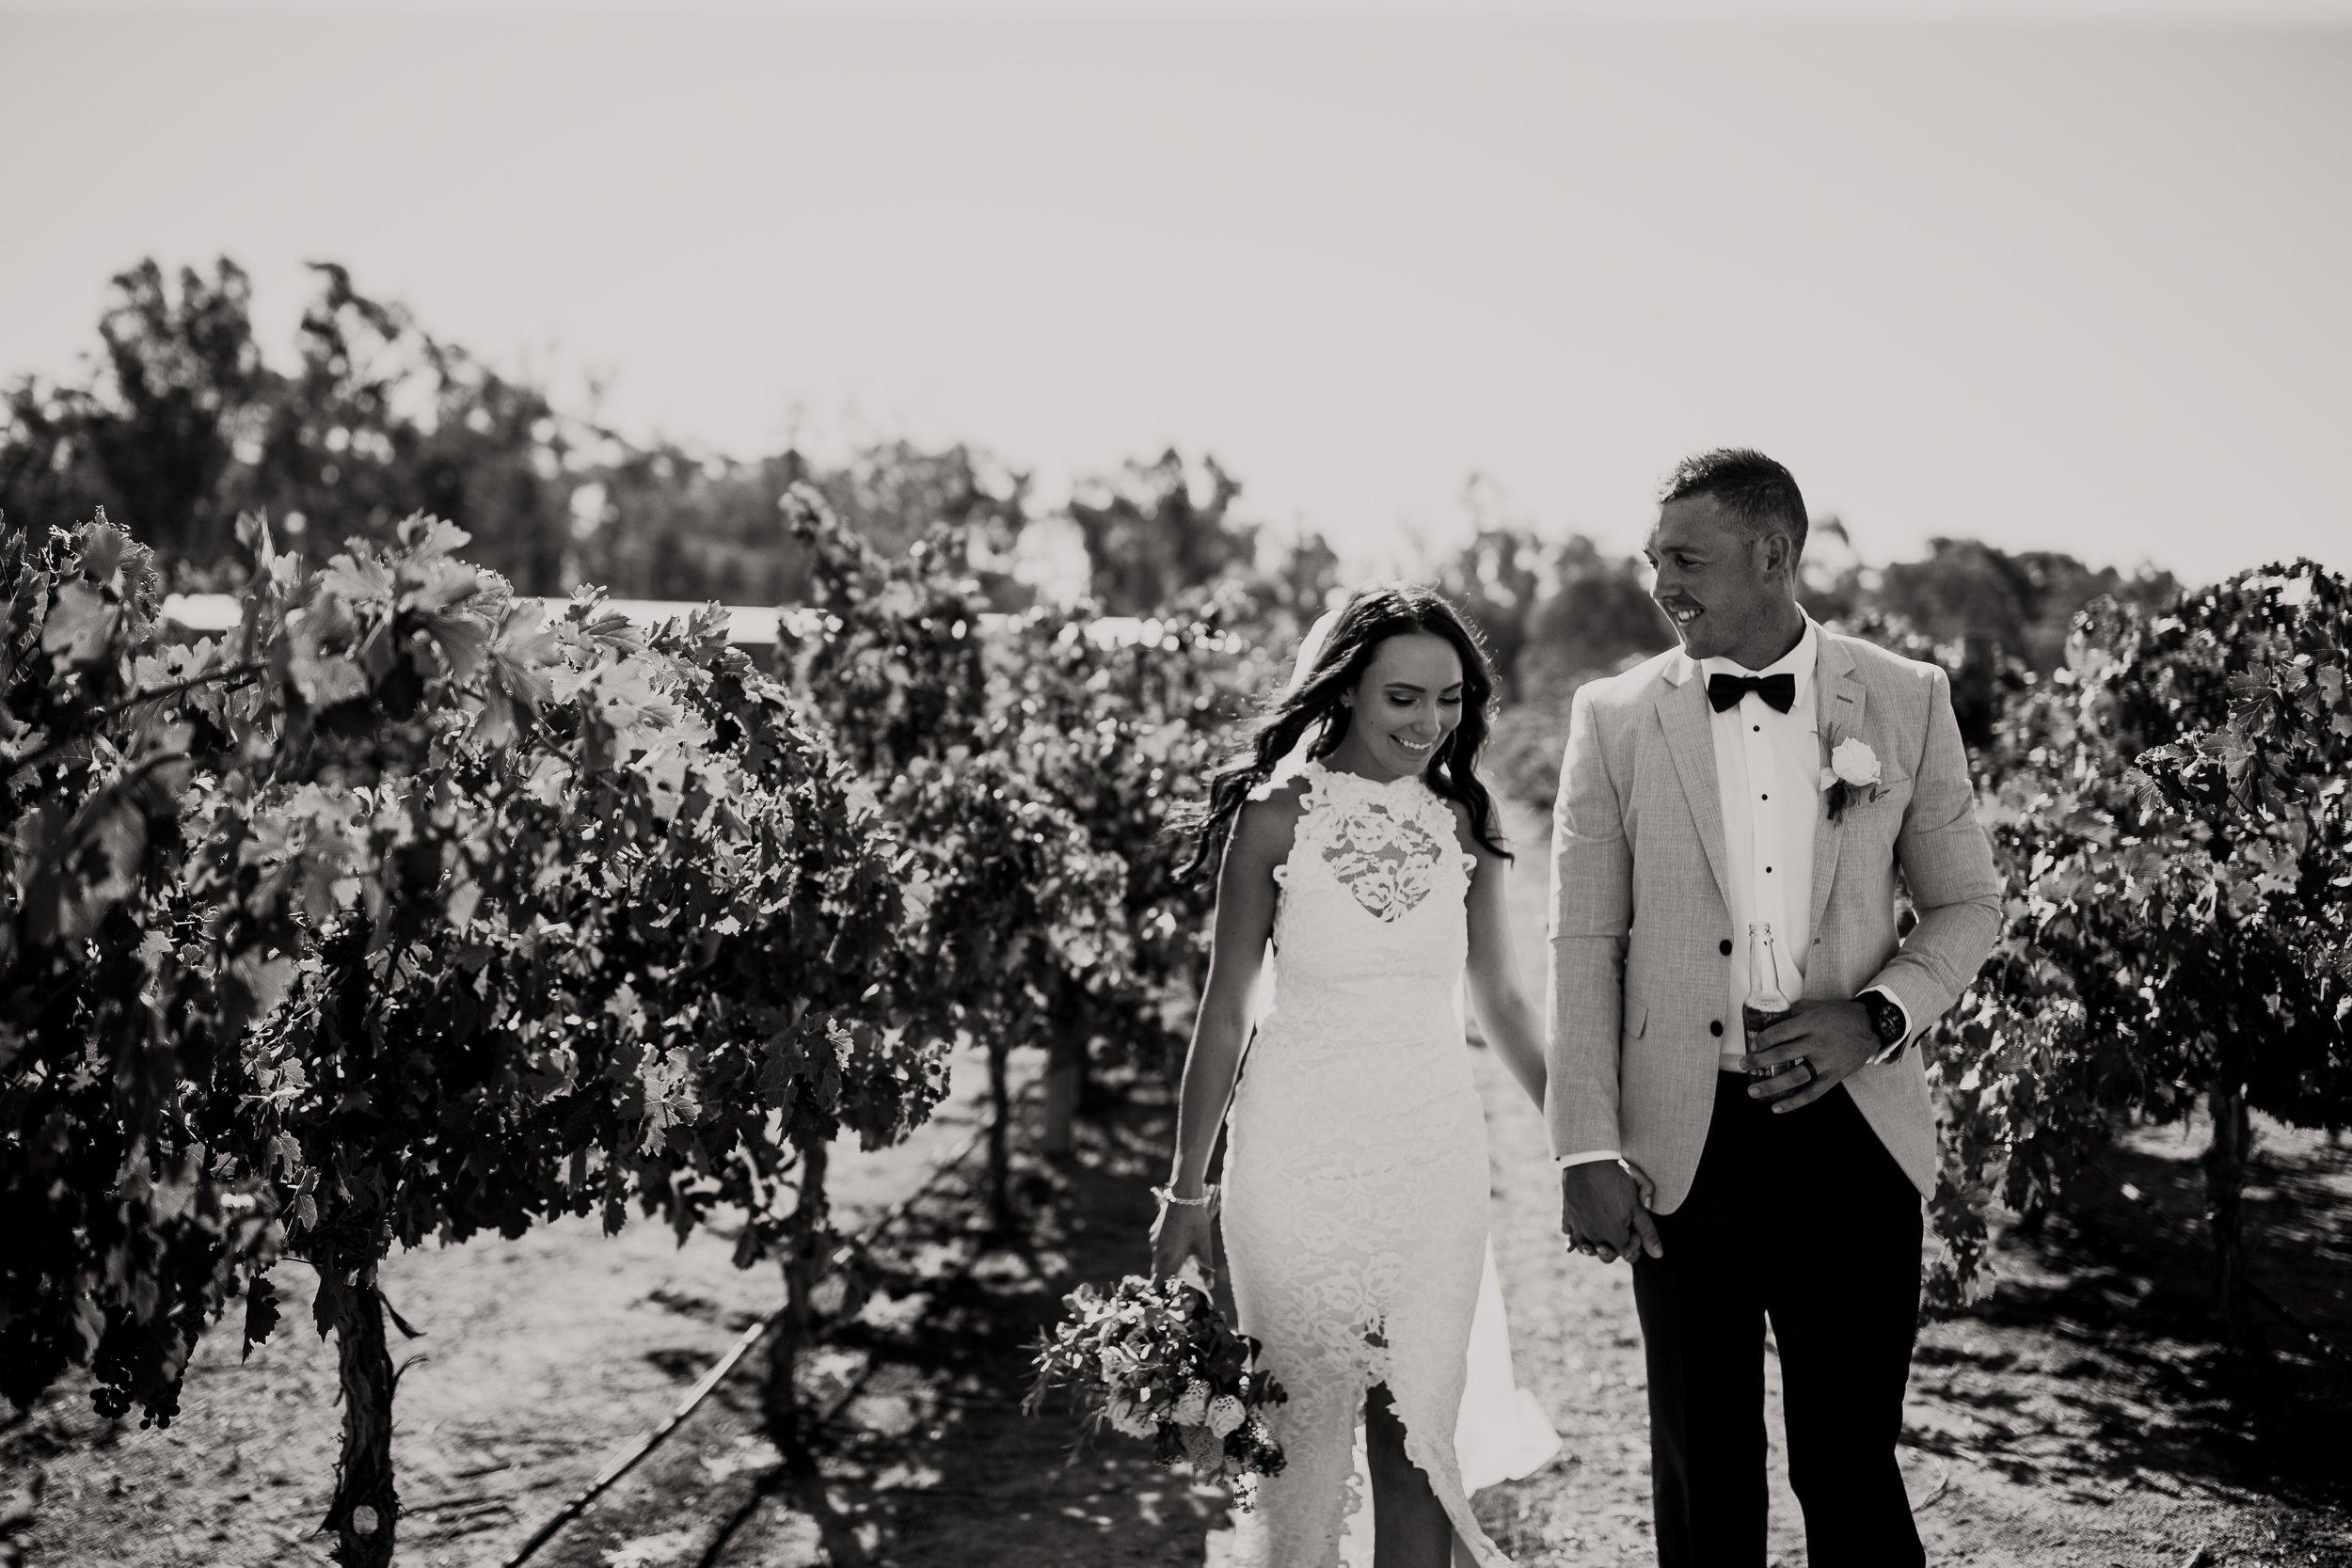 mickalathomas_puremacphotography_weddingphotographer_couplephotographer_Sheppartonphotographer_2901.jpg